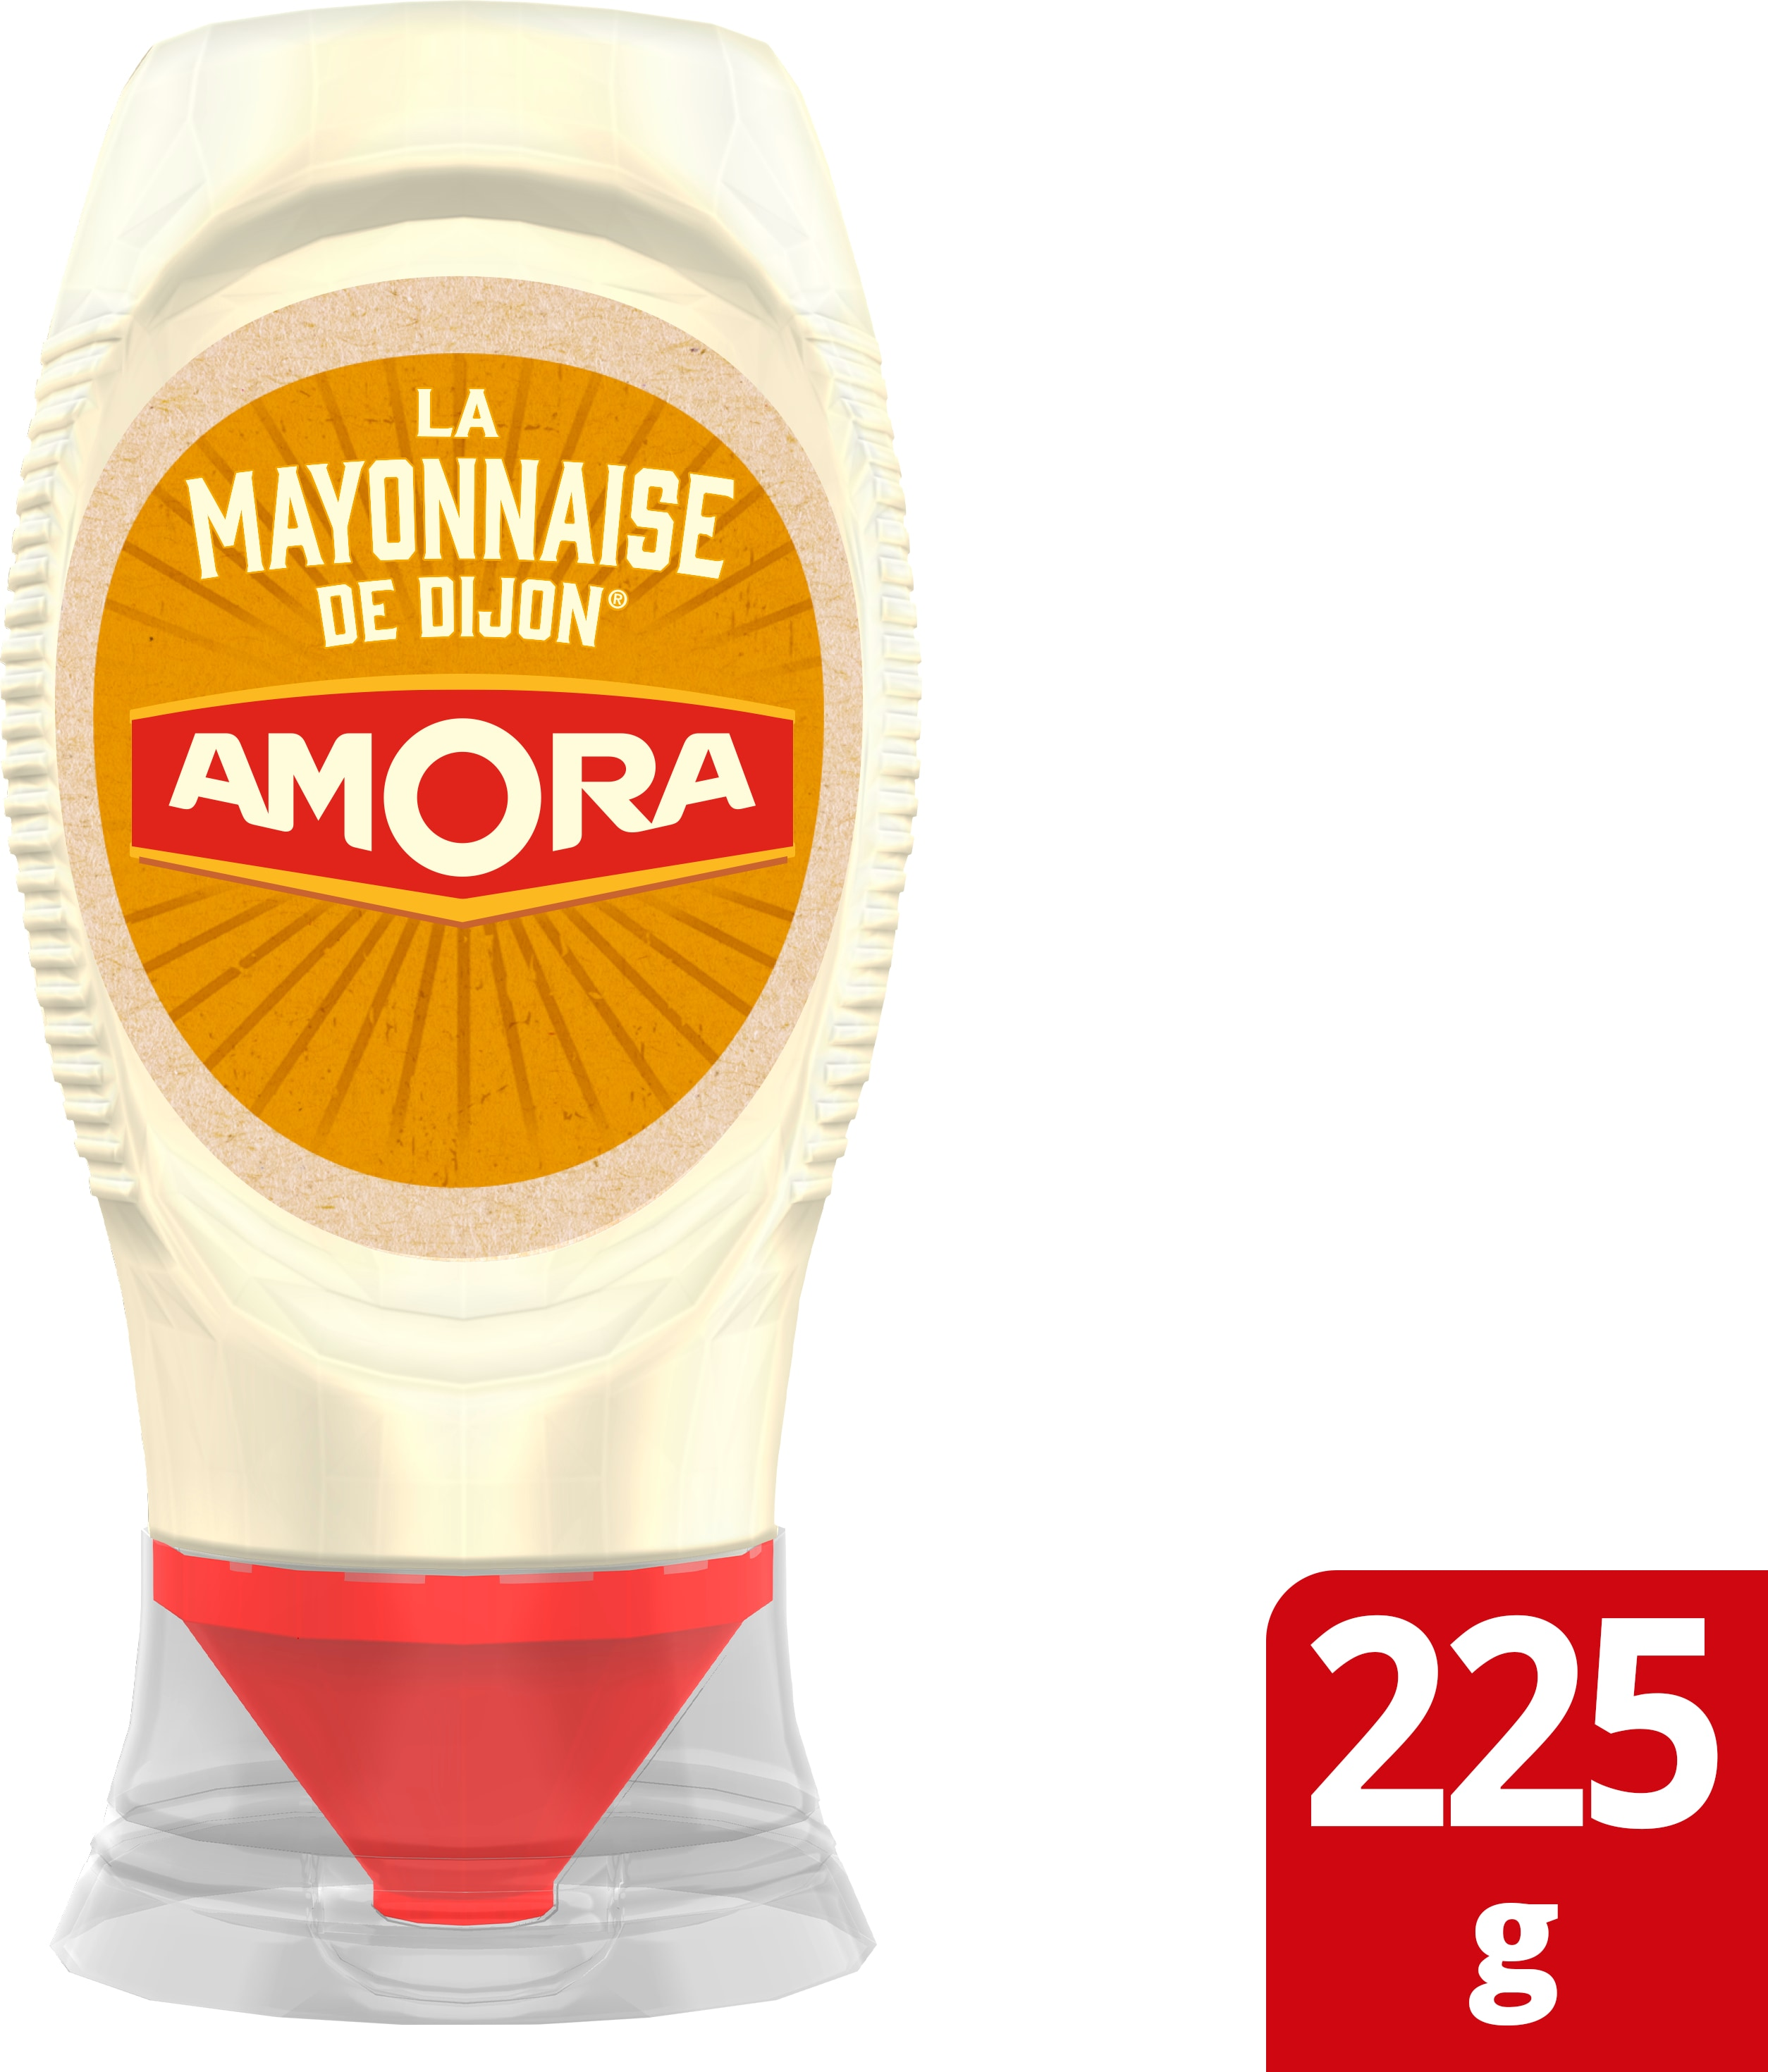 Amora mini squeeze mayonnaise 225g -